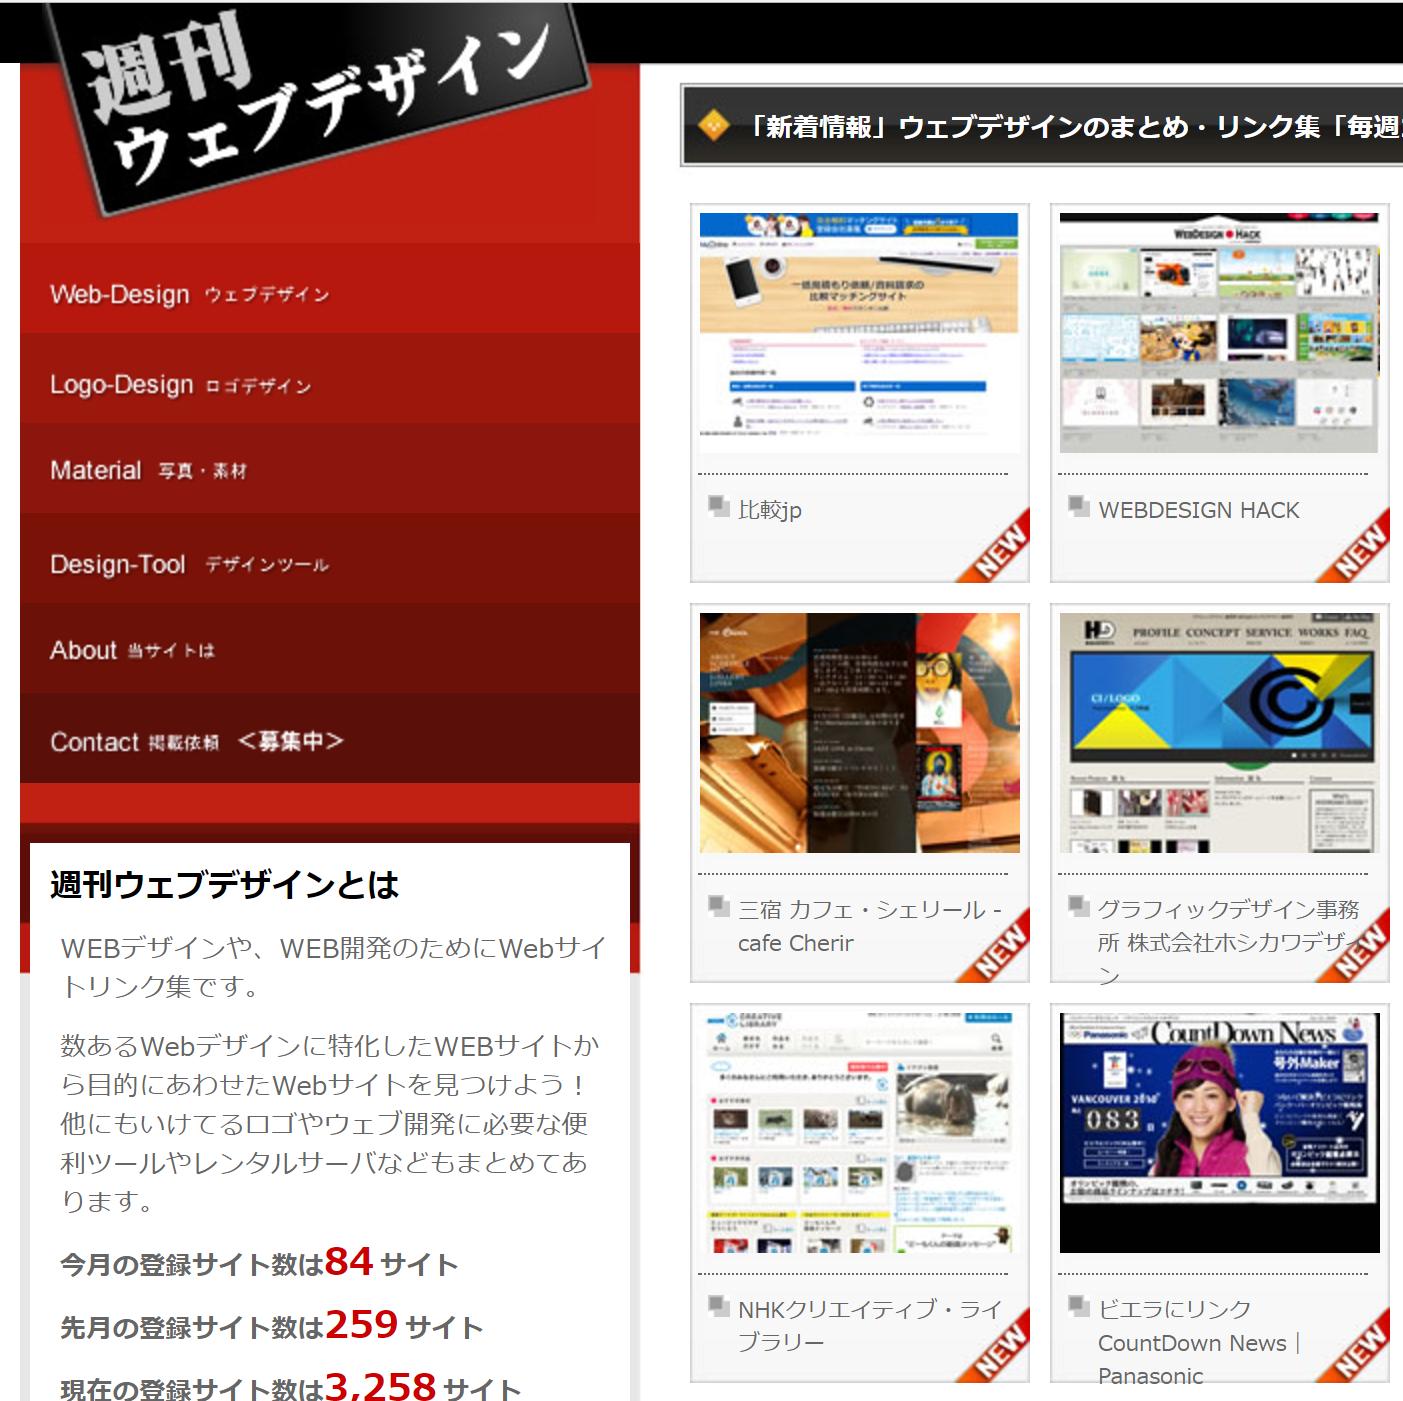 webdesign - wordpressでデザインを自作する方法とかっこいいトップページの一覧